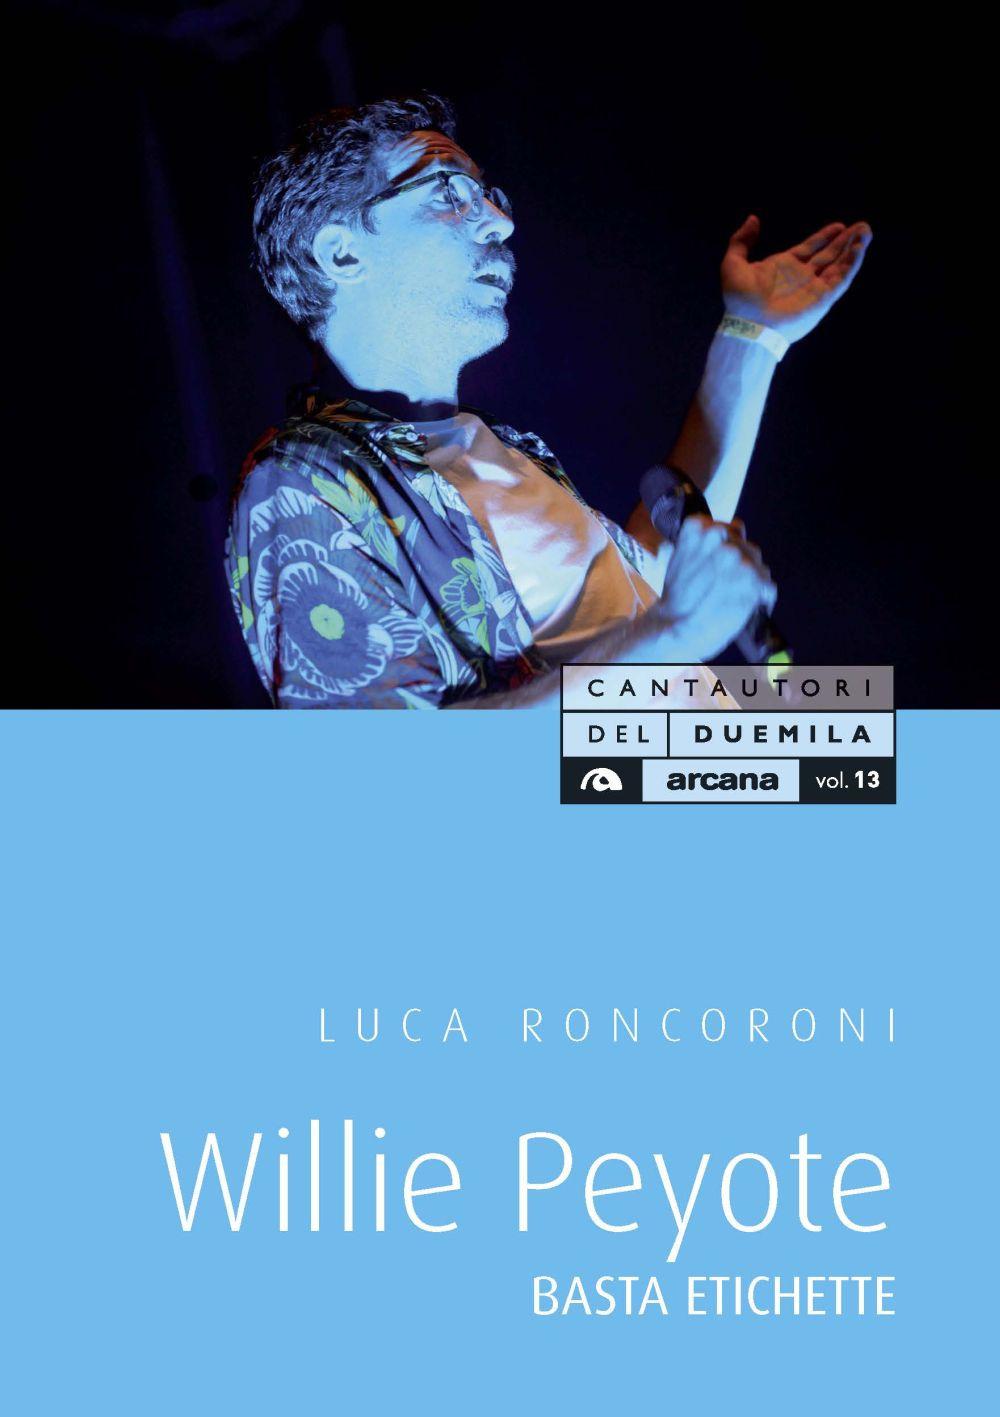 WILLIE PEYOTE. BASTA ETICHETTE - Roncoroni Luca - 9788862318341